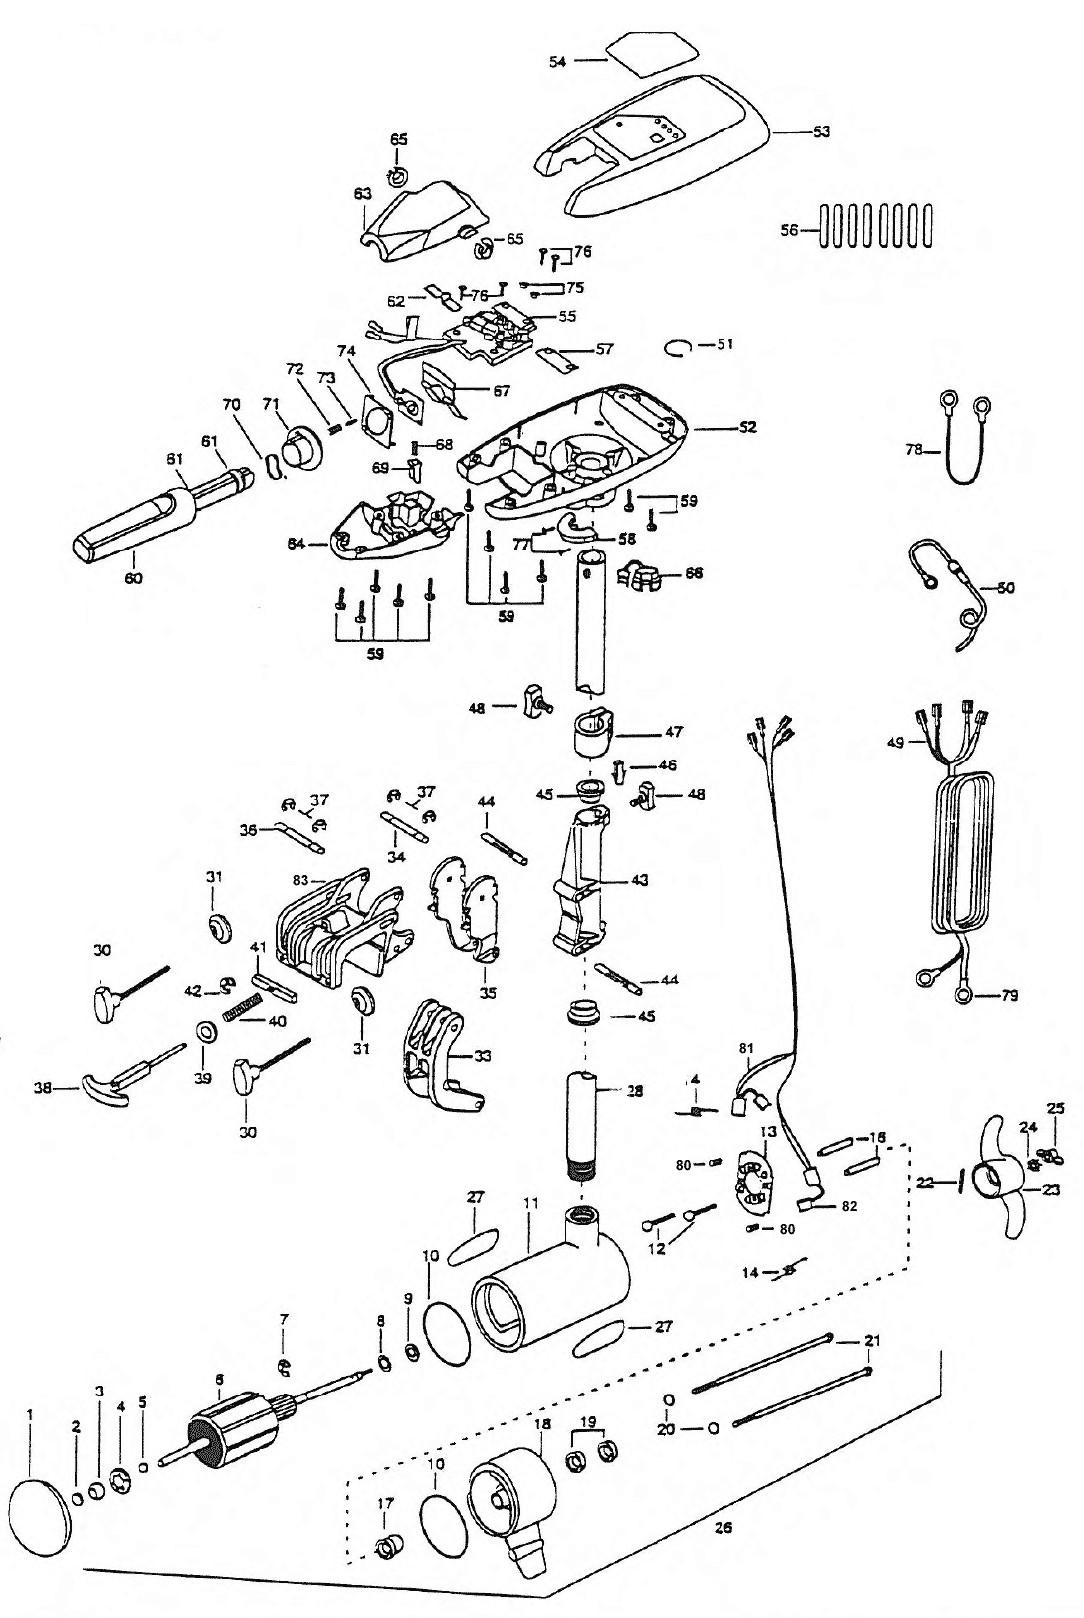 Minn Kota 65 Lb Thrust All Terrain Trolling Motor Parts Sonar Wiring Diagrams 35 Manual Open Source User